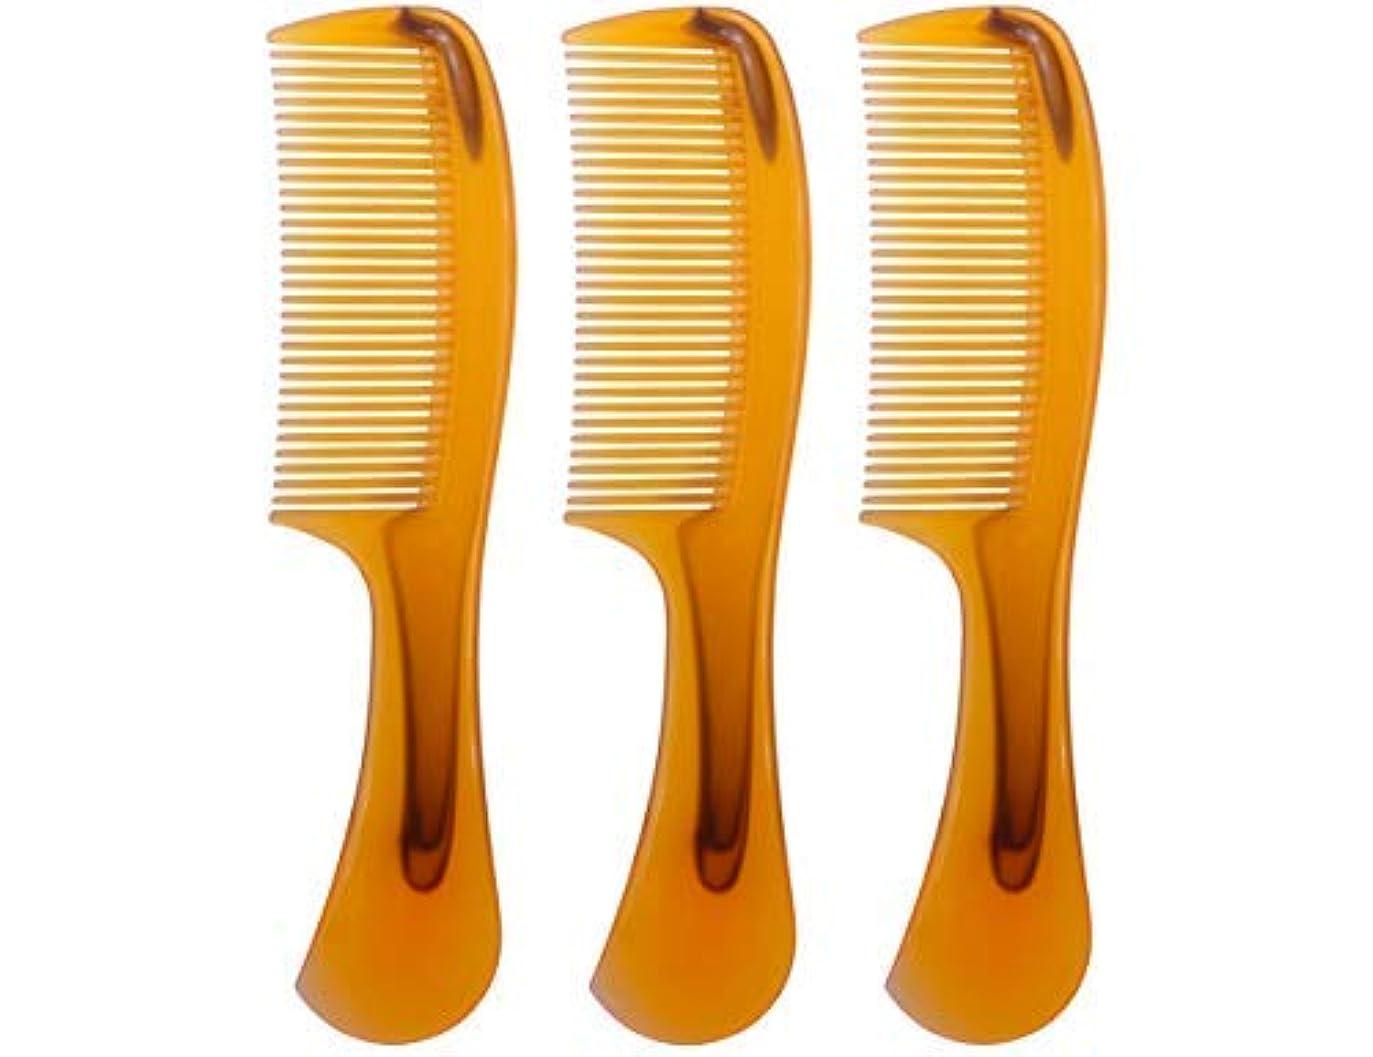 LBY 3pcs 16 cm Hair Comb Round Handle Comb Hair Care Comb Plastic Yellow [並行輸入品]